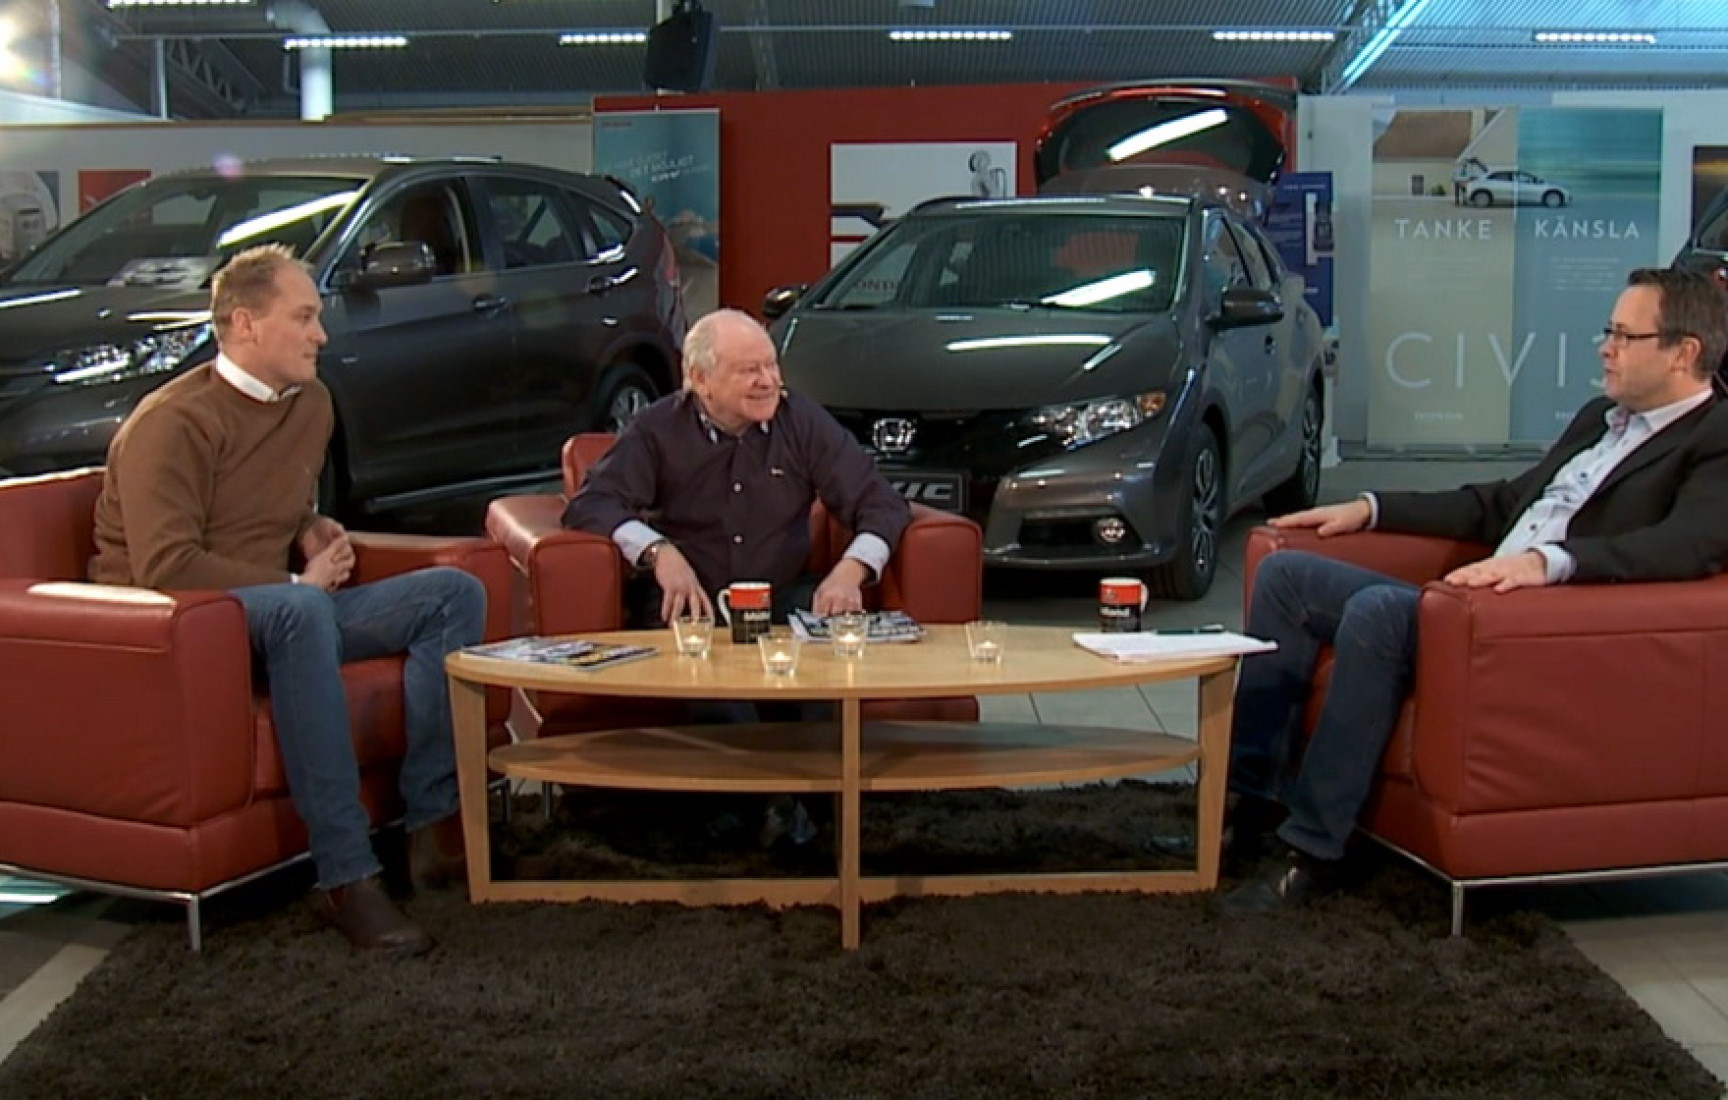 Glimt Sport – Rallyspecial